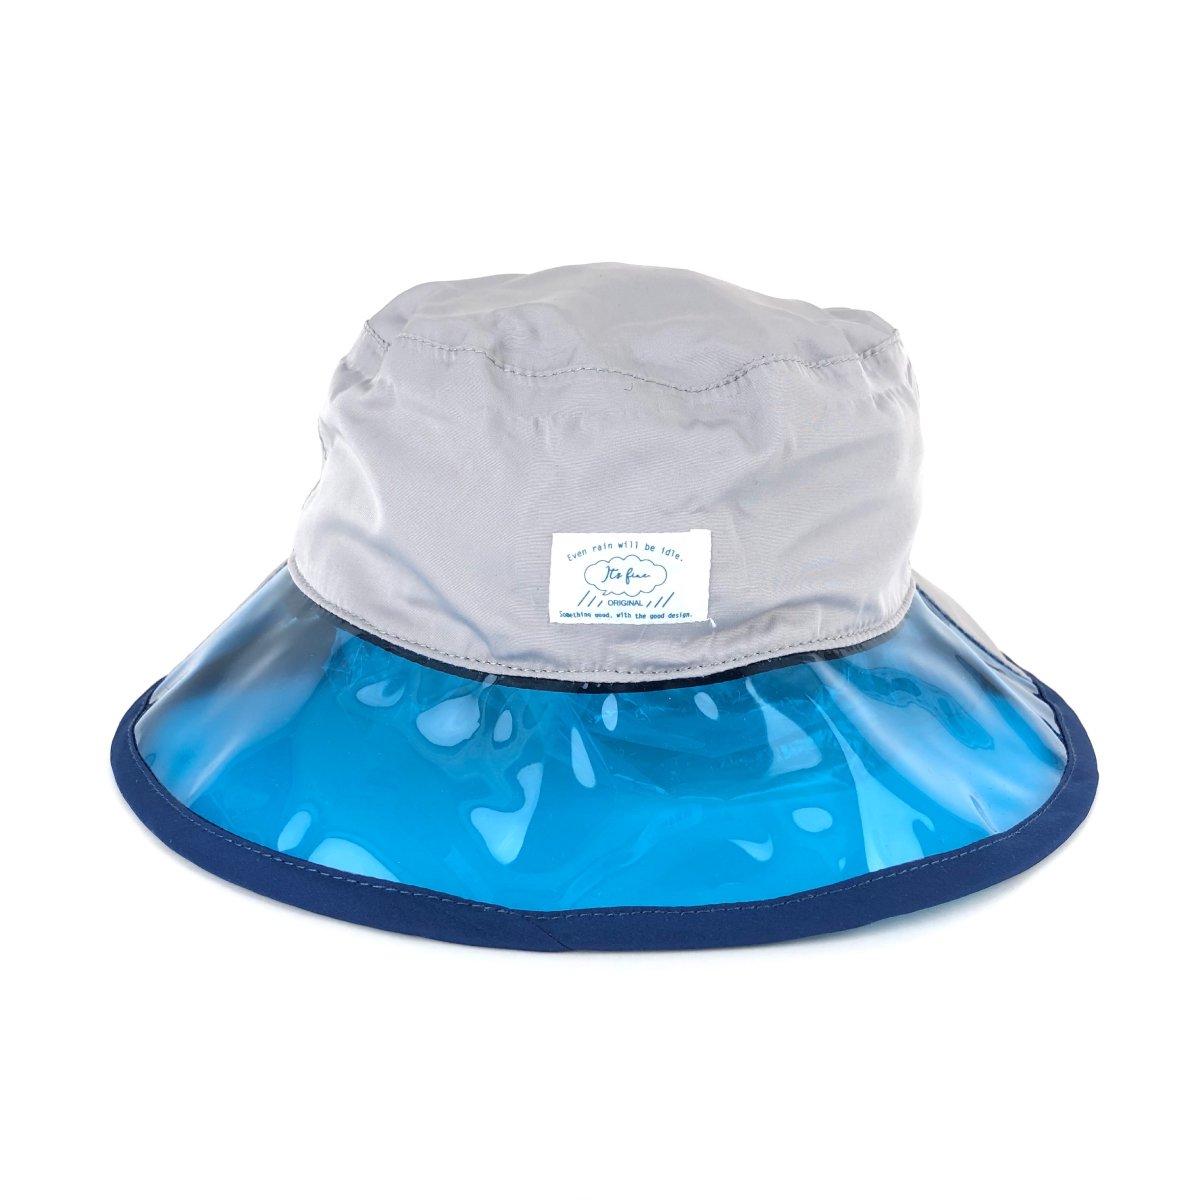 【BABY】Baby Rain PVC Hat 詳細画像1